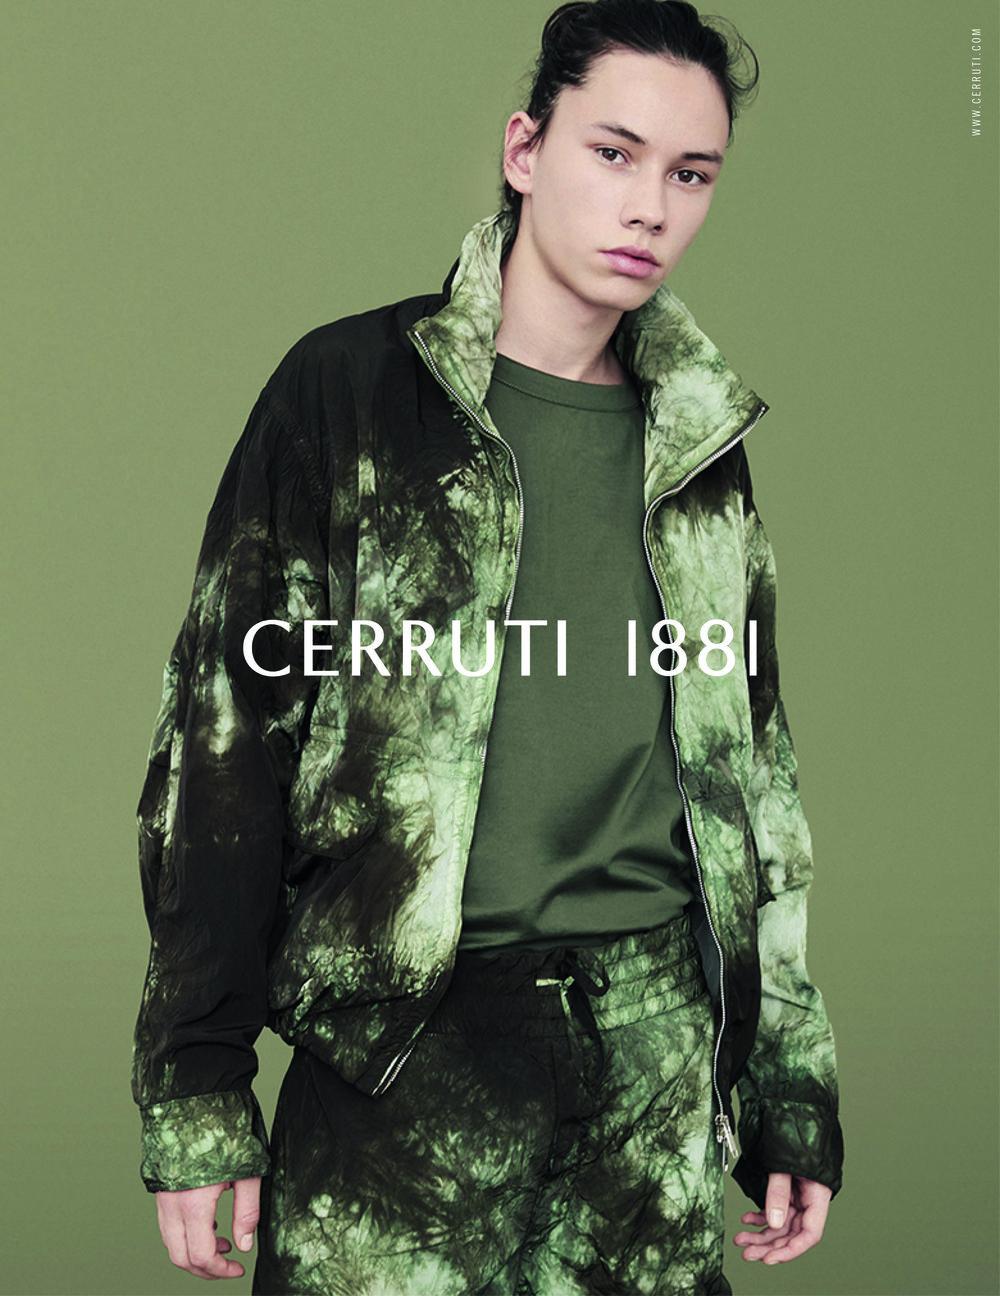 Cerruti - 2.jpg